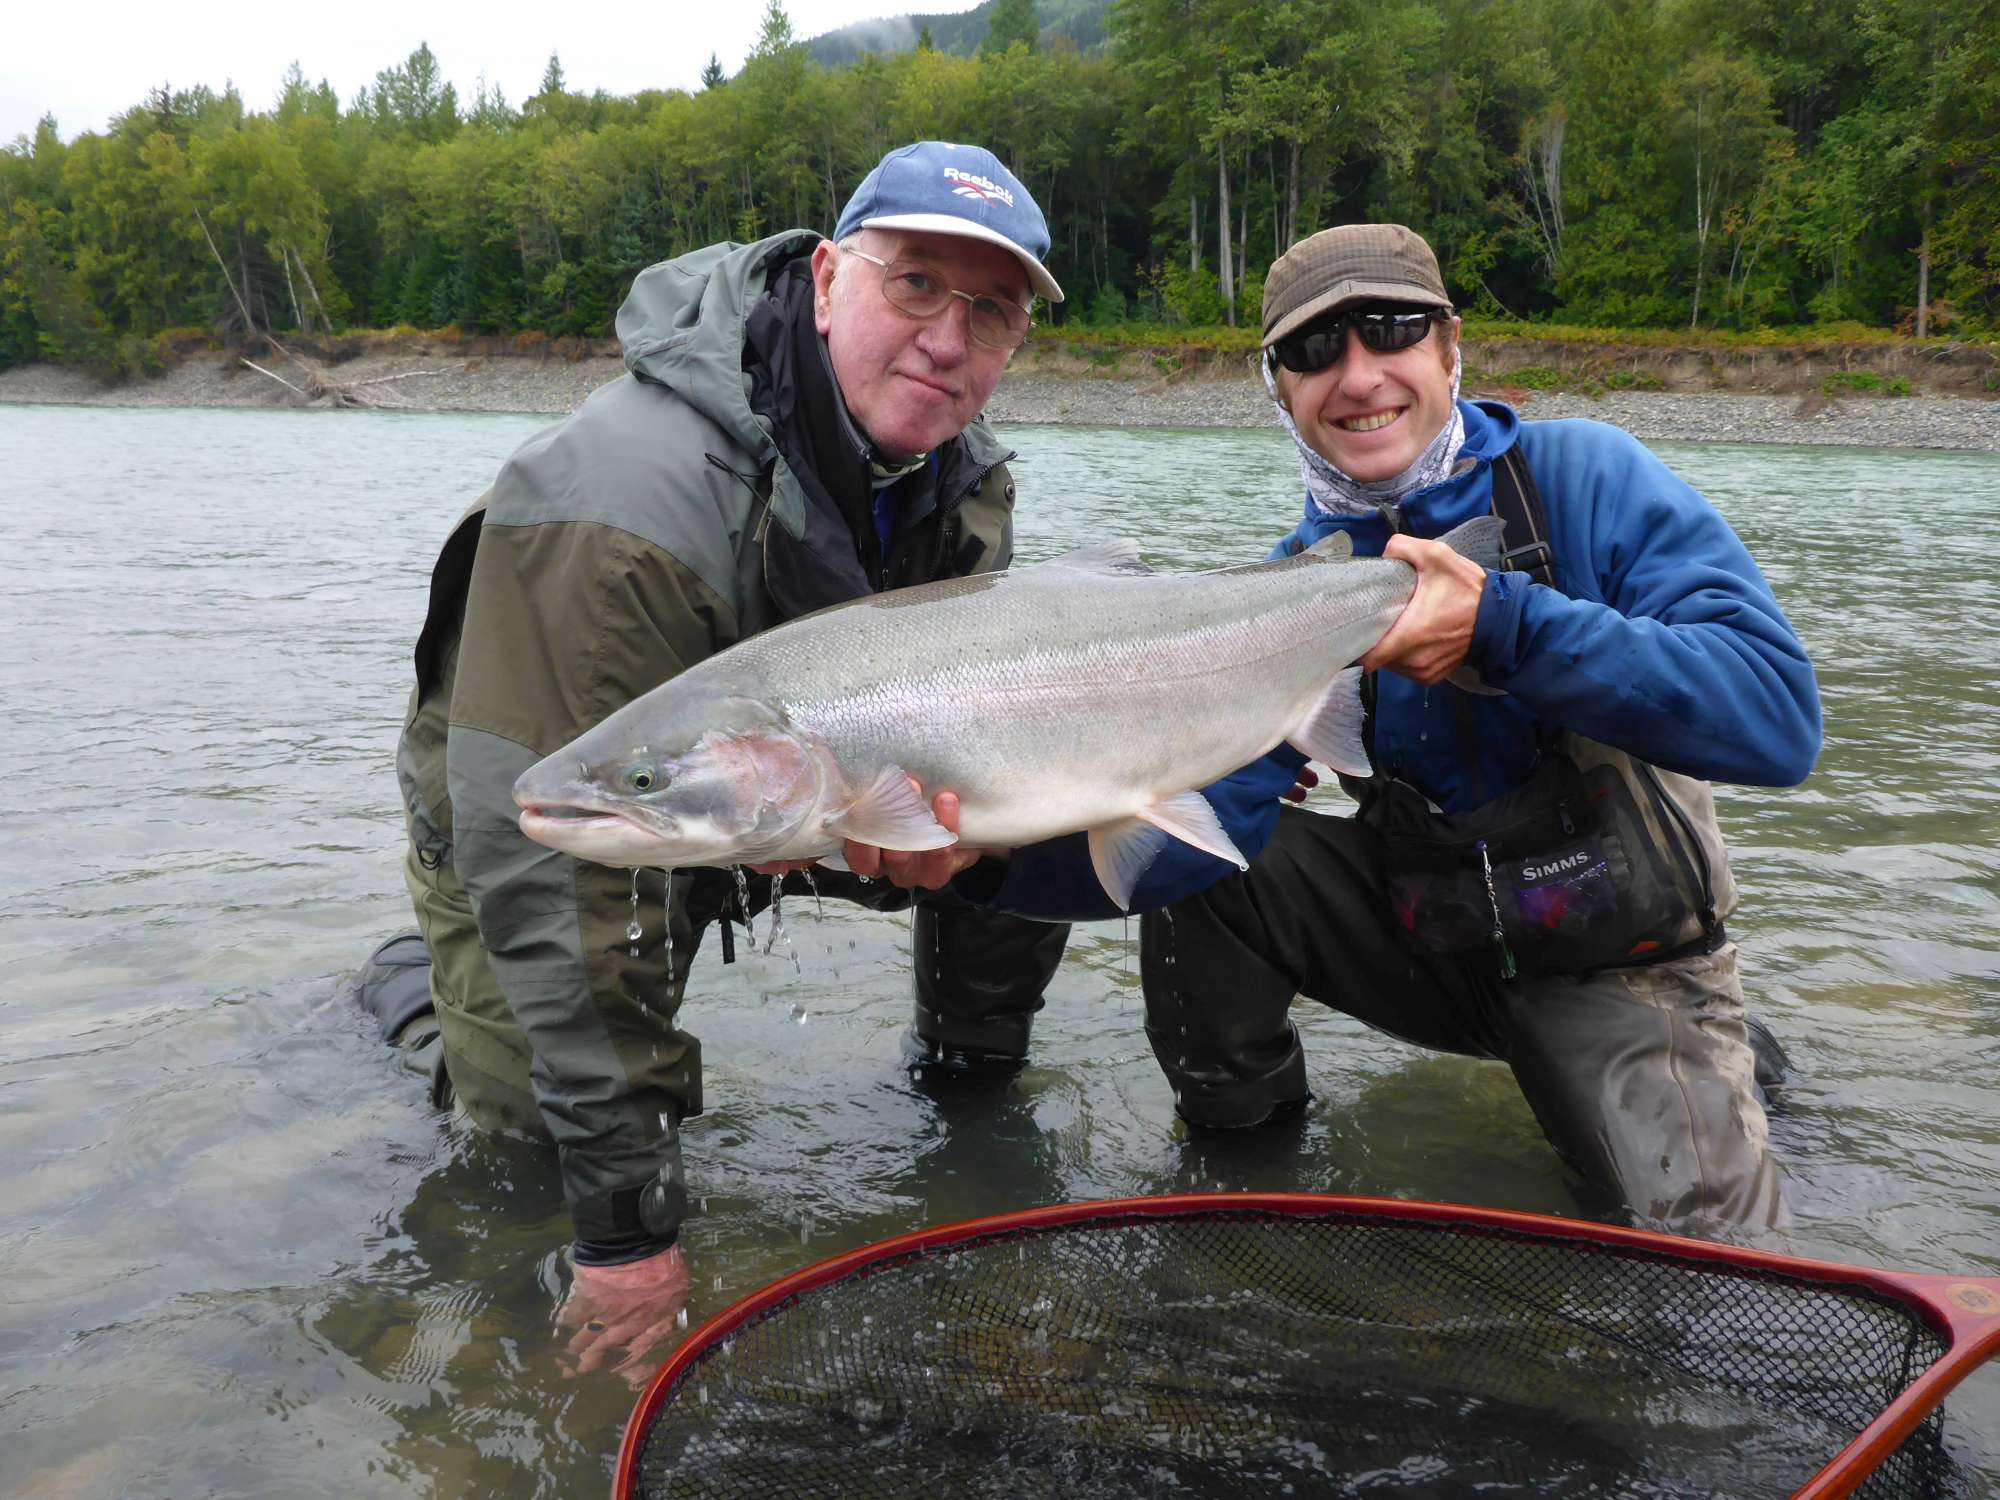 Steelhead fishing fly fishing nicholas dean lodge aardvark mcleod sciox Image collections